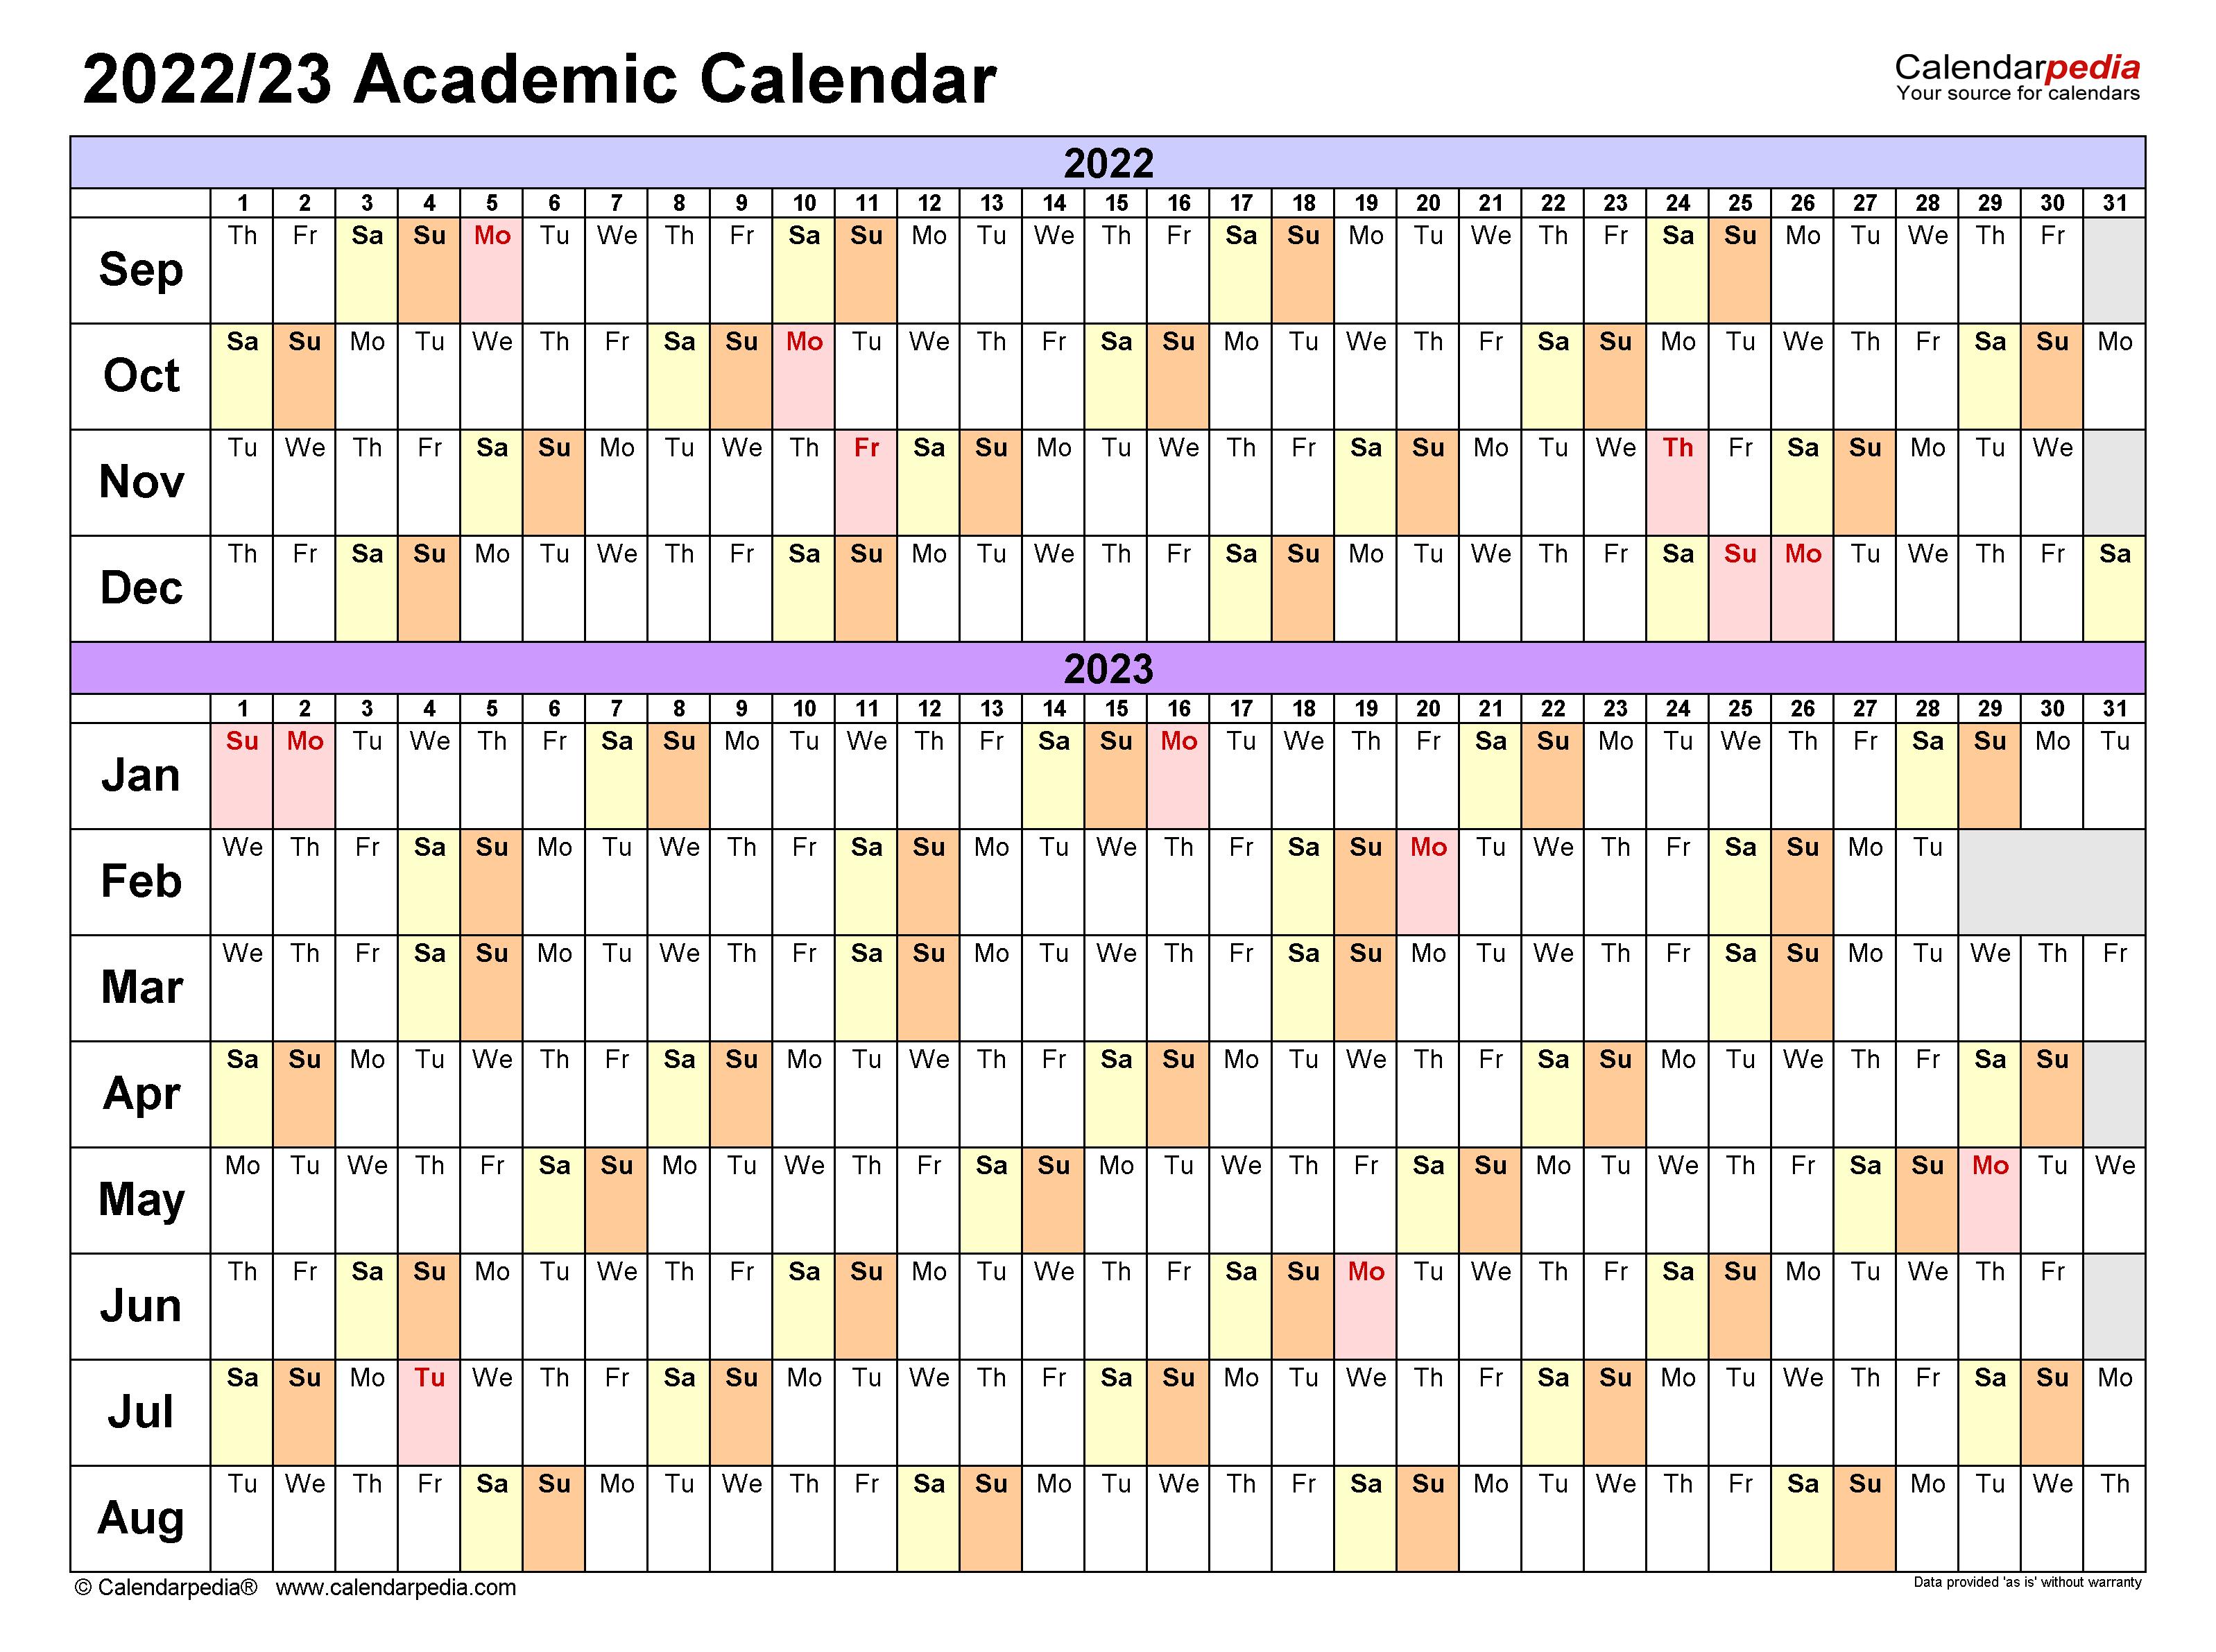 Cal Poly Academic Calendar 2022 2023.Academic Calendars 2022 2023 Free Printable Excel Templates